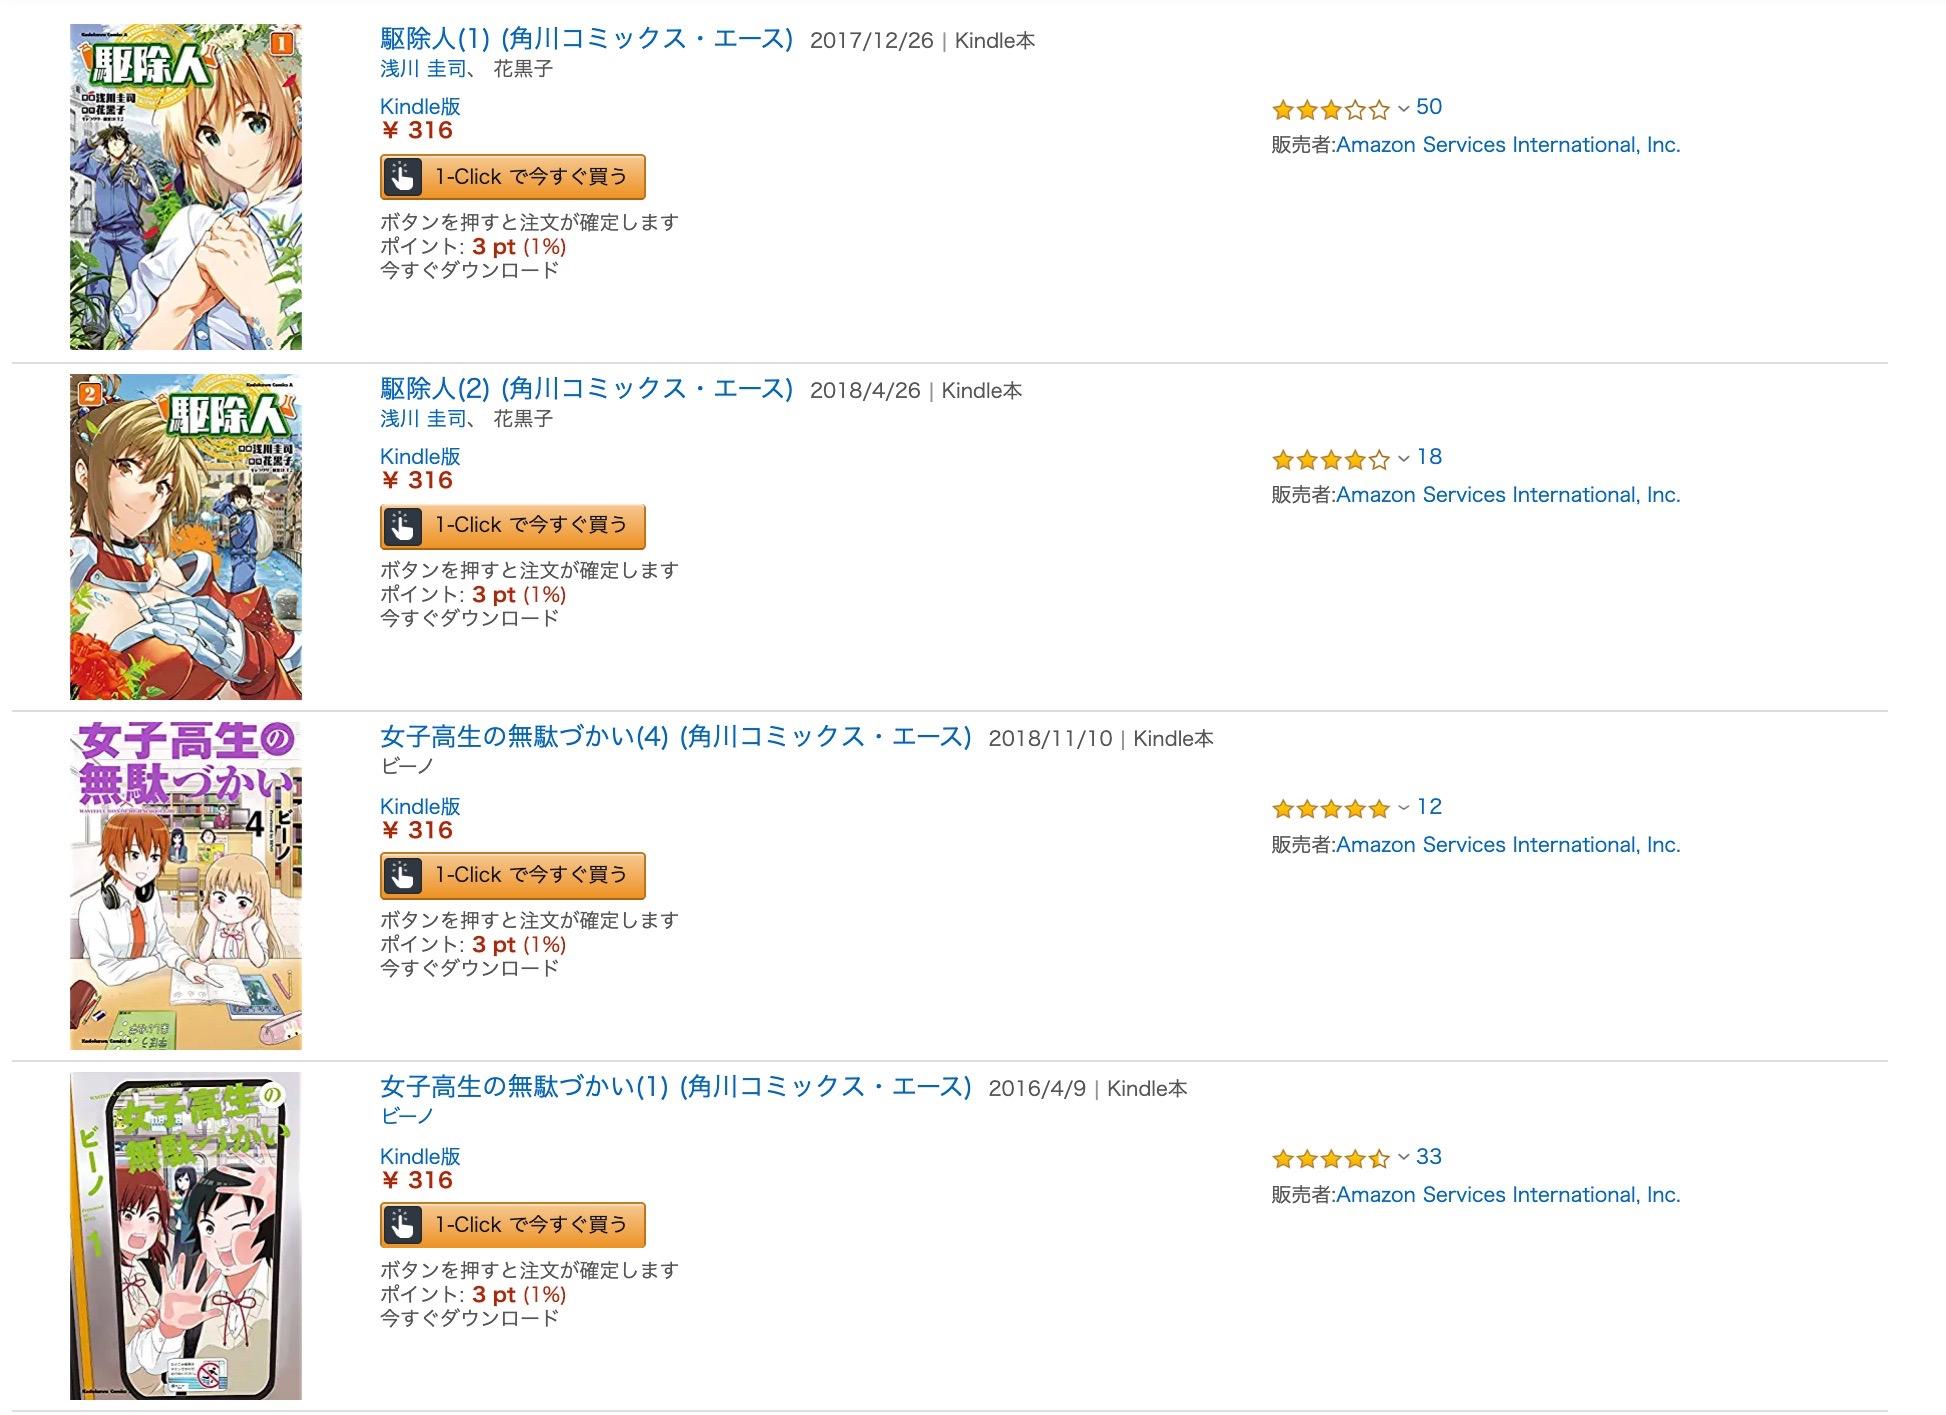 Amazon co jp 秋の読書フェア Kindleストア